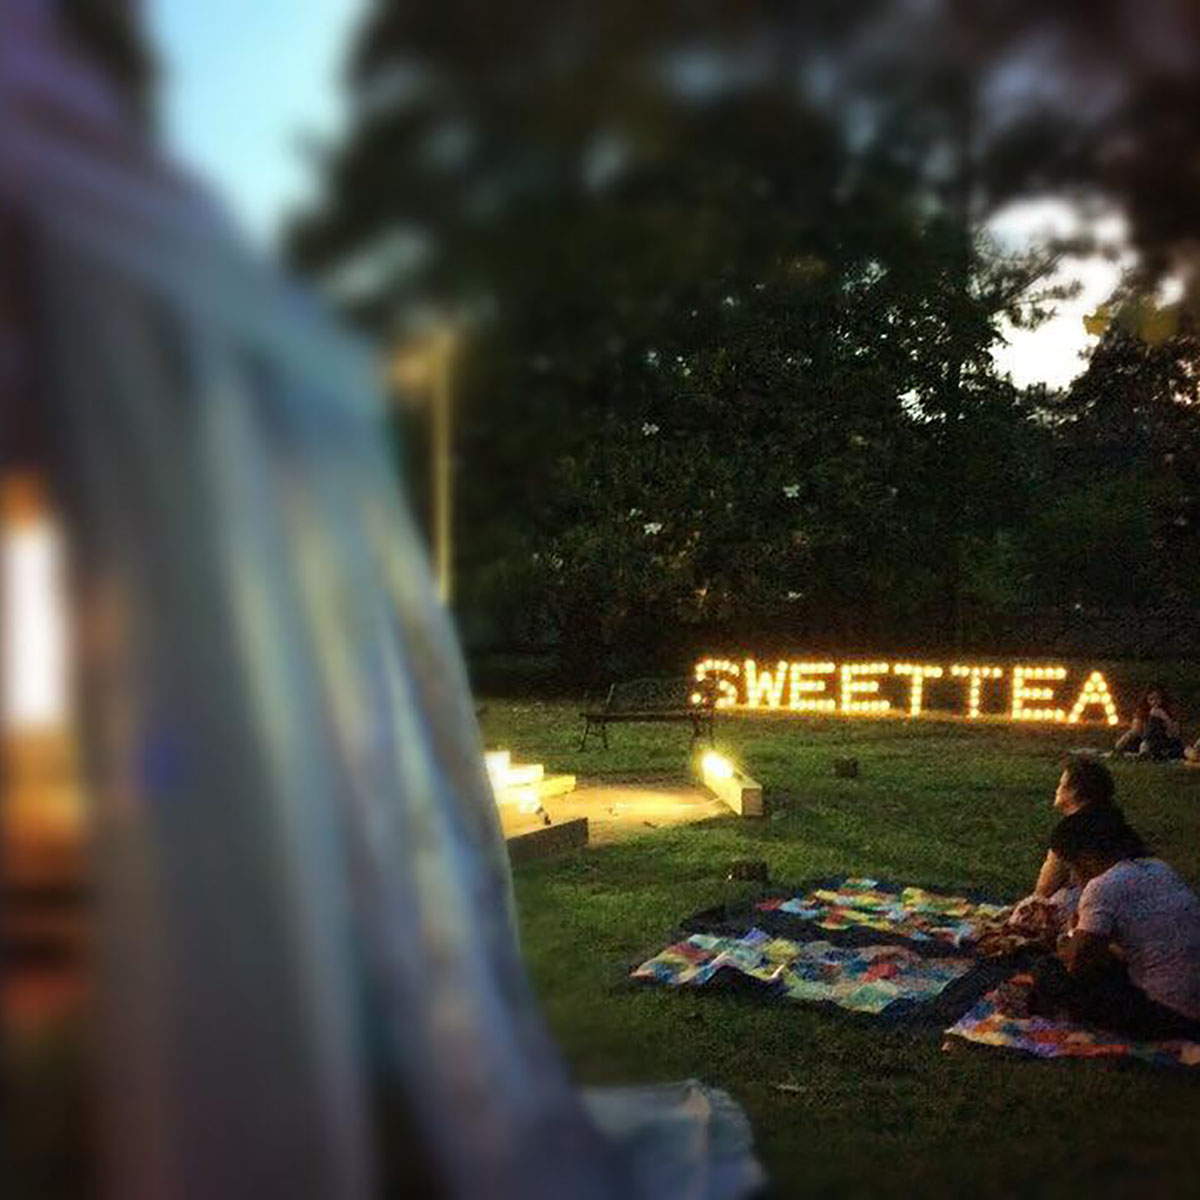 sweetteashakespeare2.jpg